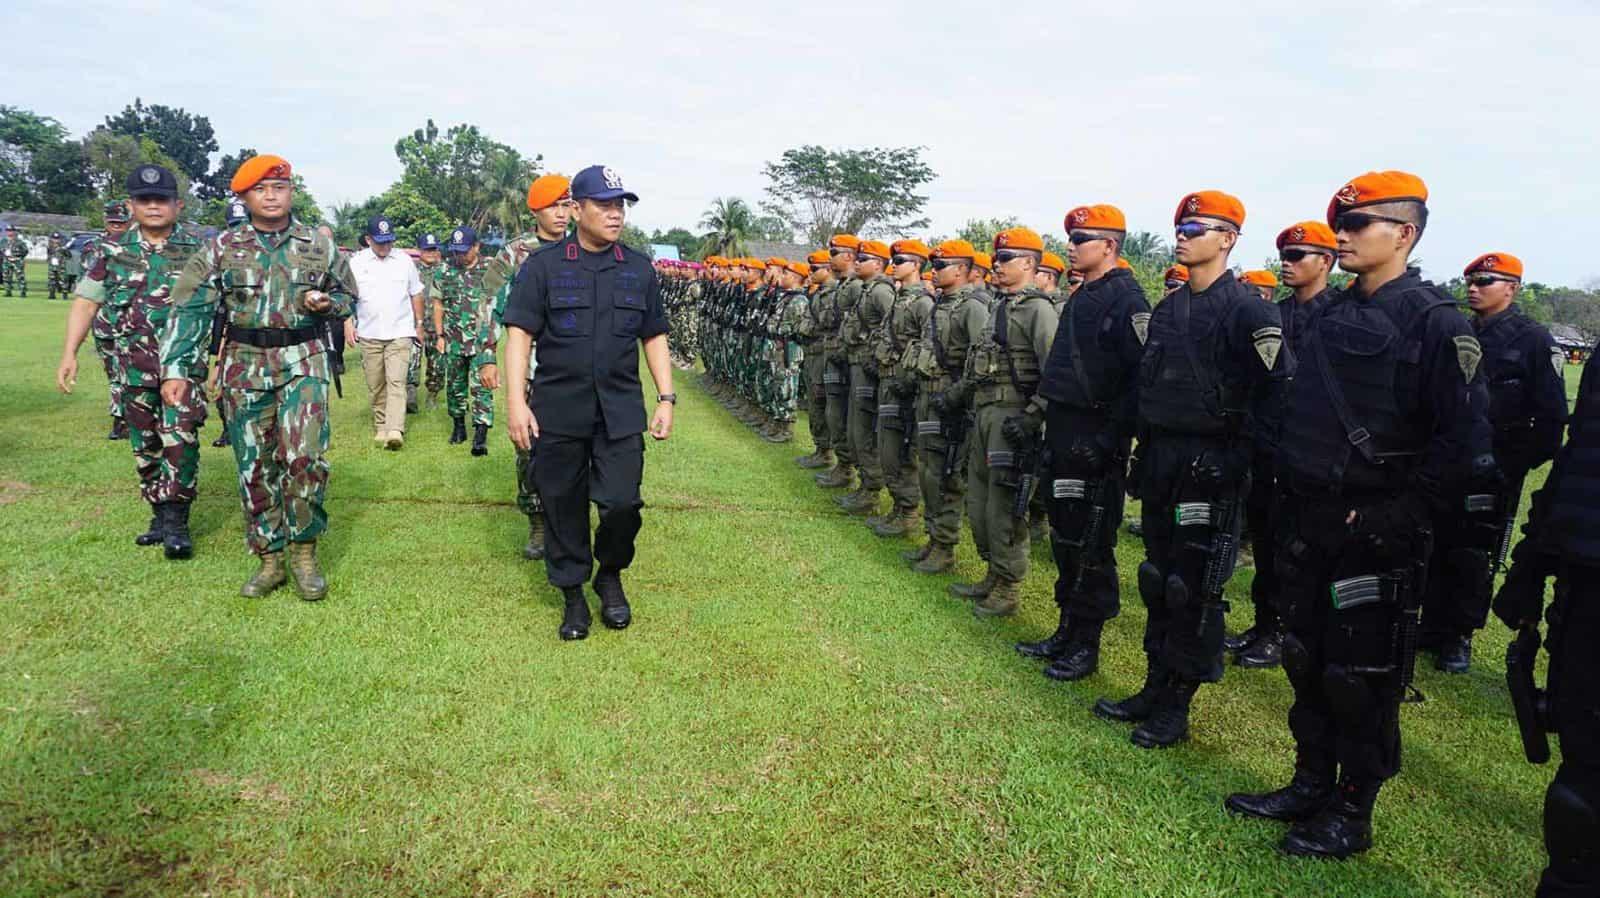 Apel Kesiapsiagaan Nasional, Penutupan Dan Simulasi Pelatihan Penanggulangan Terorisme Akibat Serangan KBRN Di Sumut